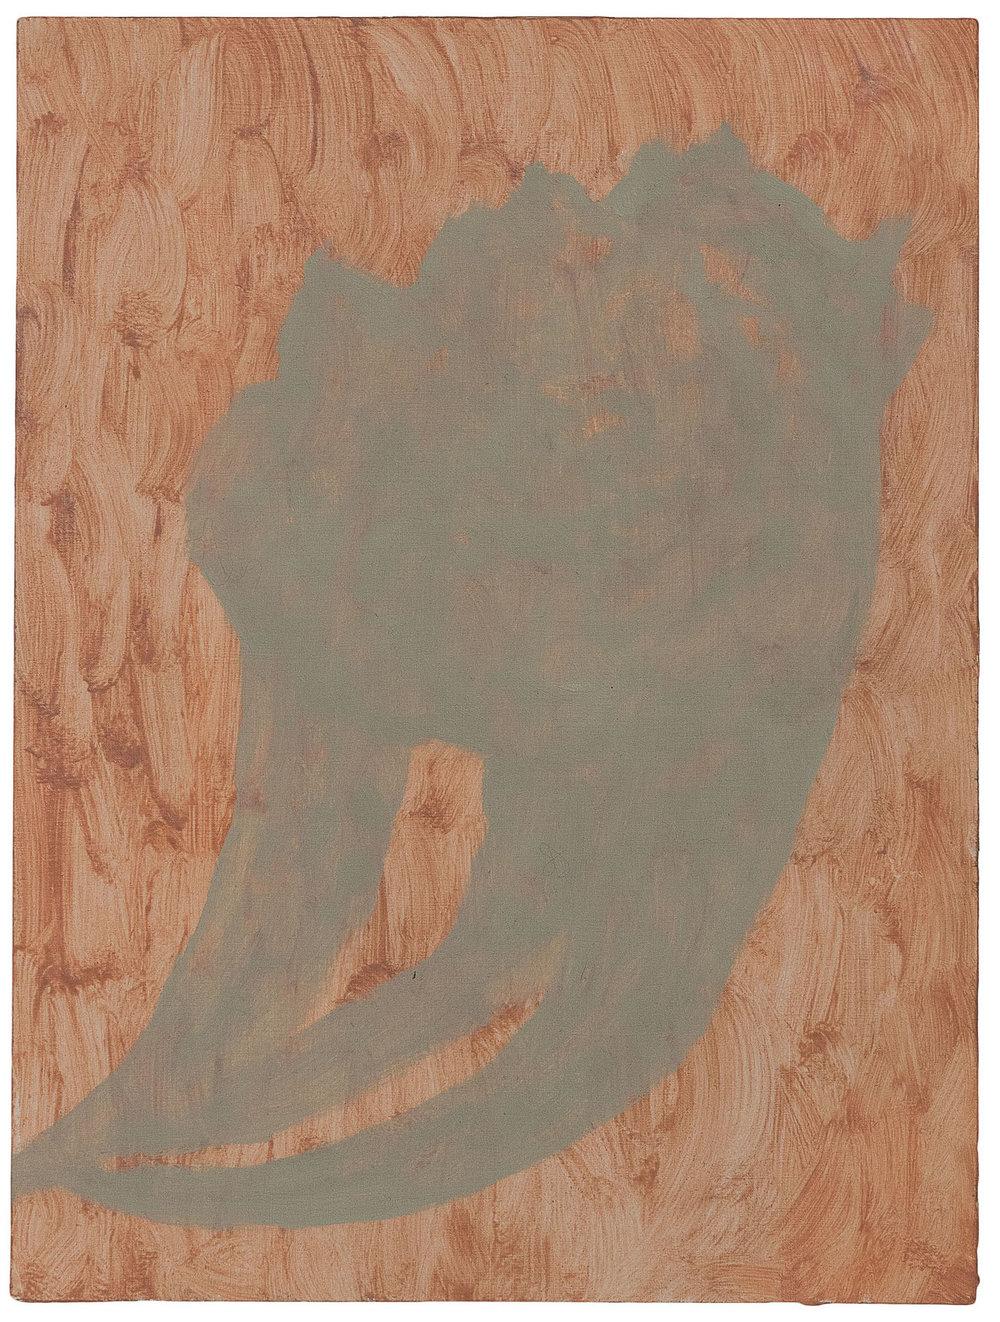 Veronika Hilger, untitled, oil on paper on wood, 2018